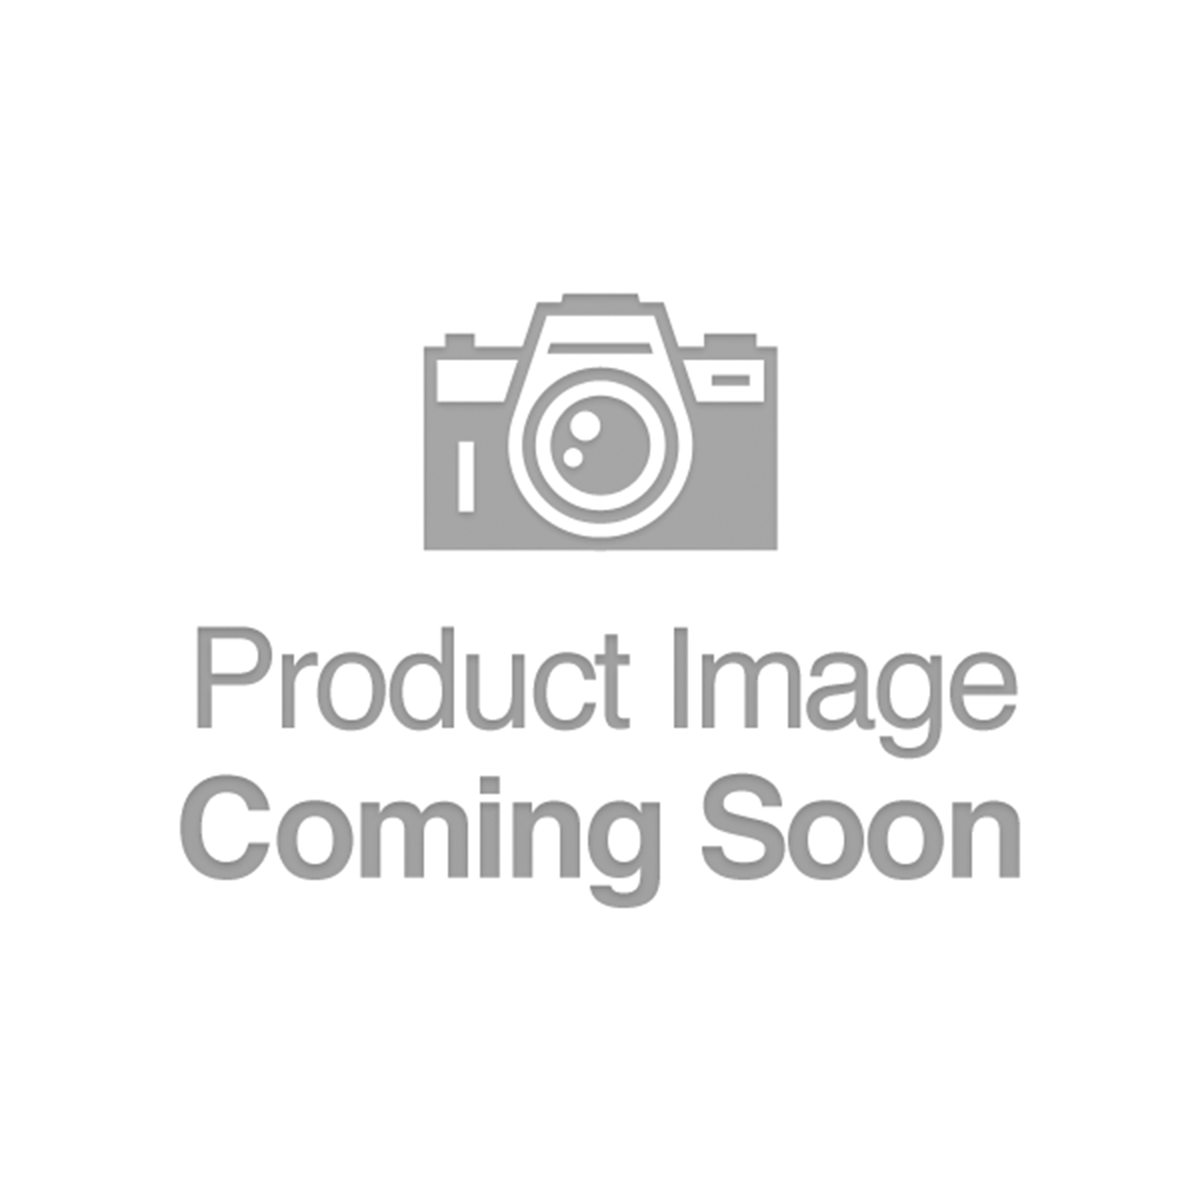 Uncirculated 1791 Washington Large Eagle Cent PCGS MS61BN